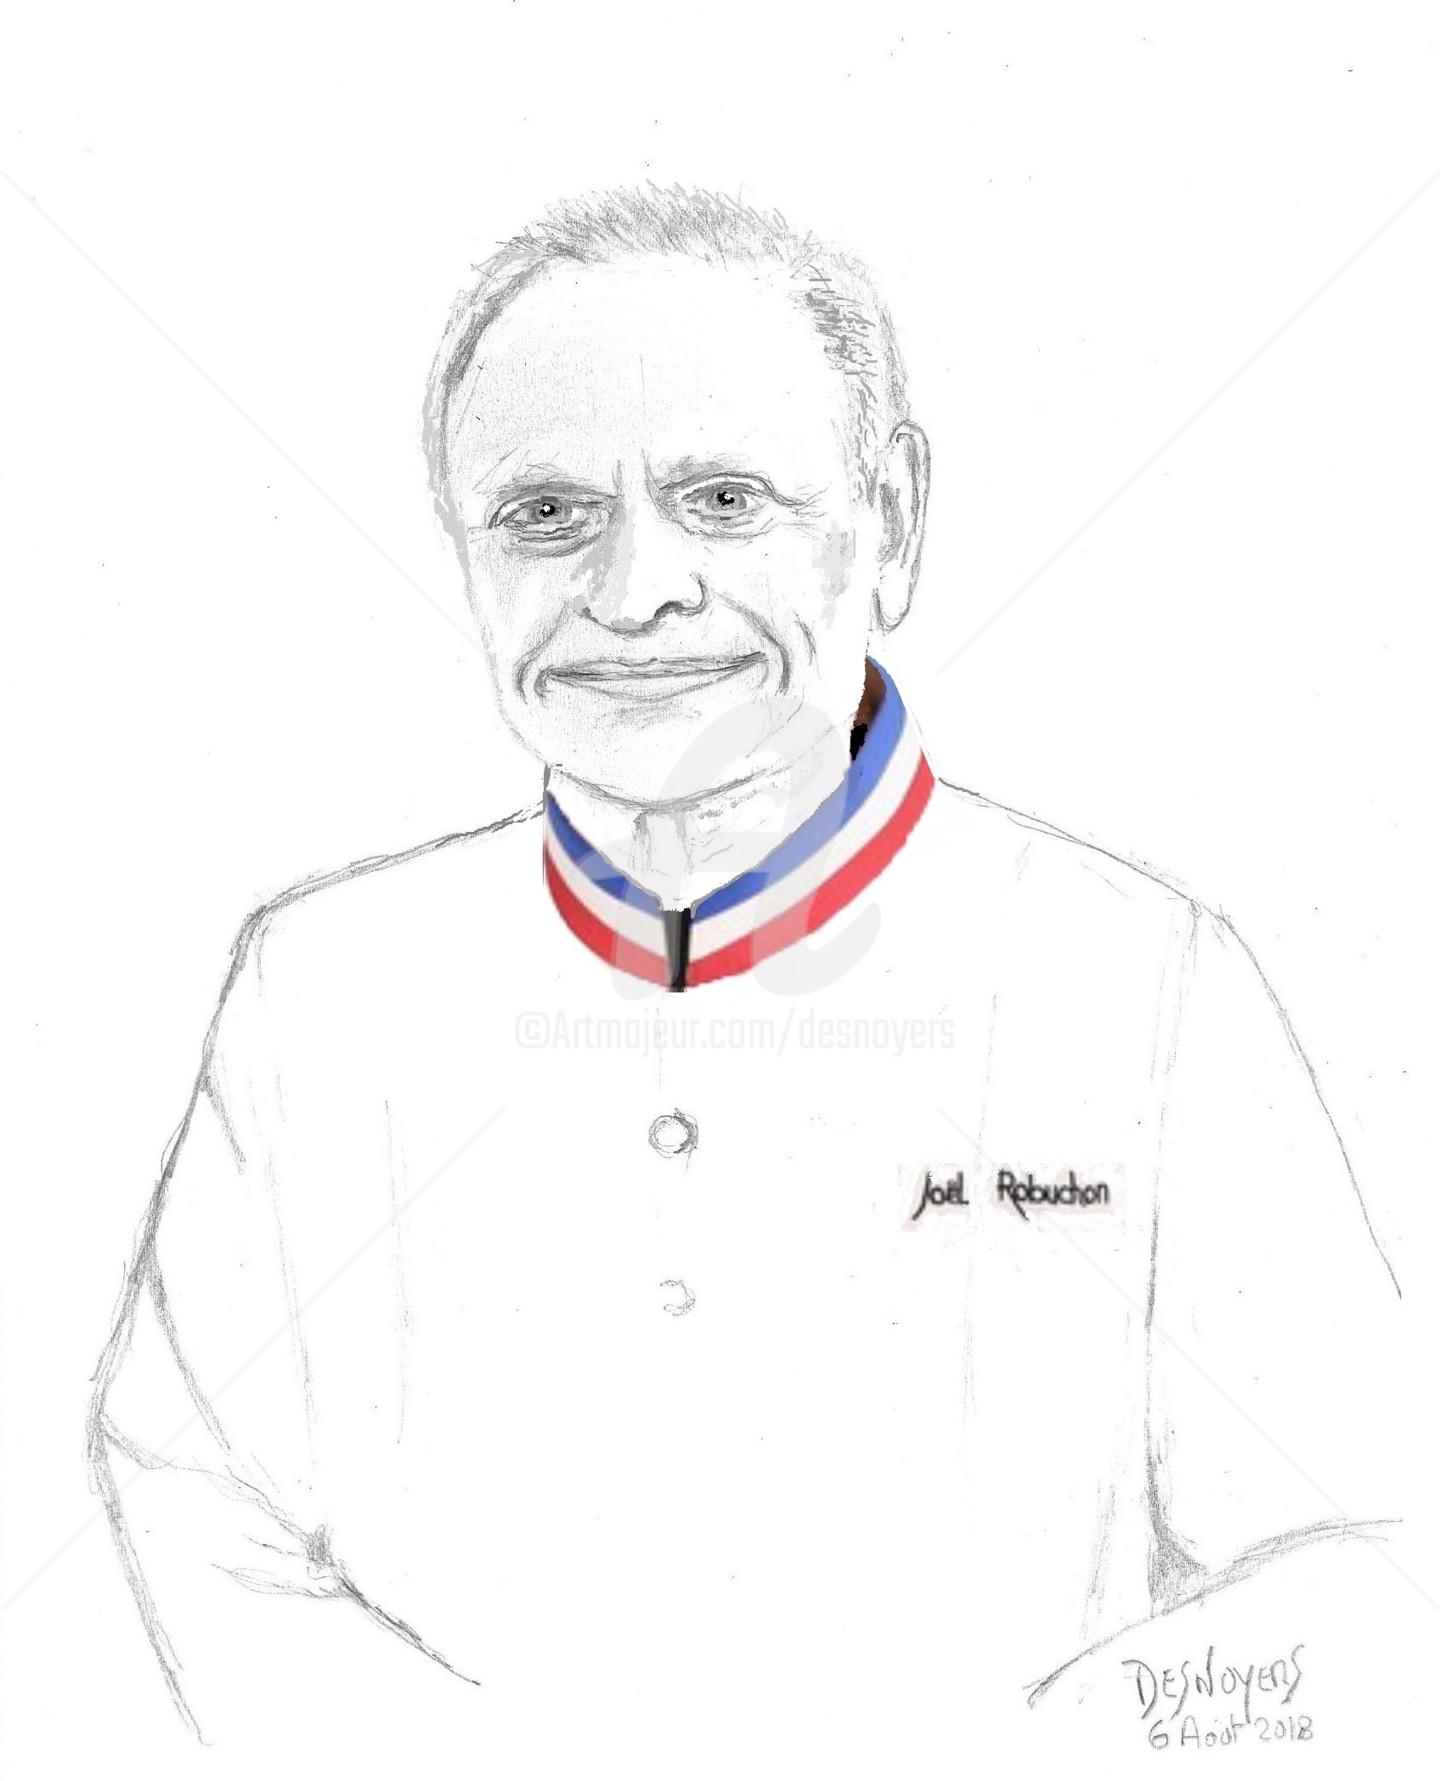 Desnoyers - Joël Robuchon